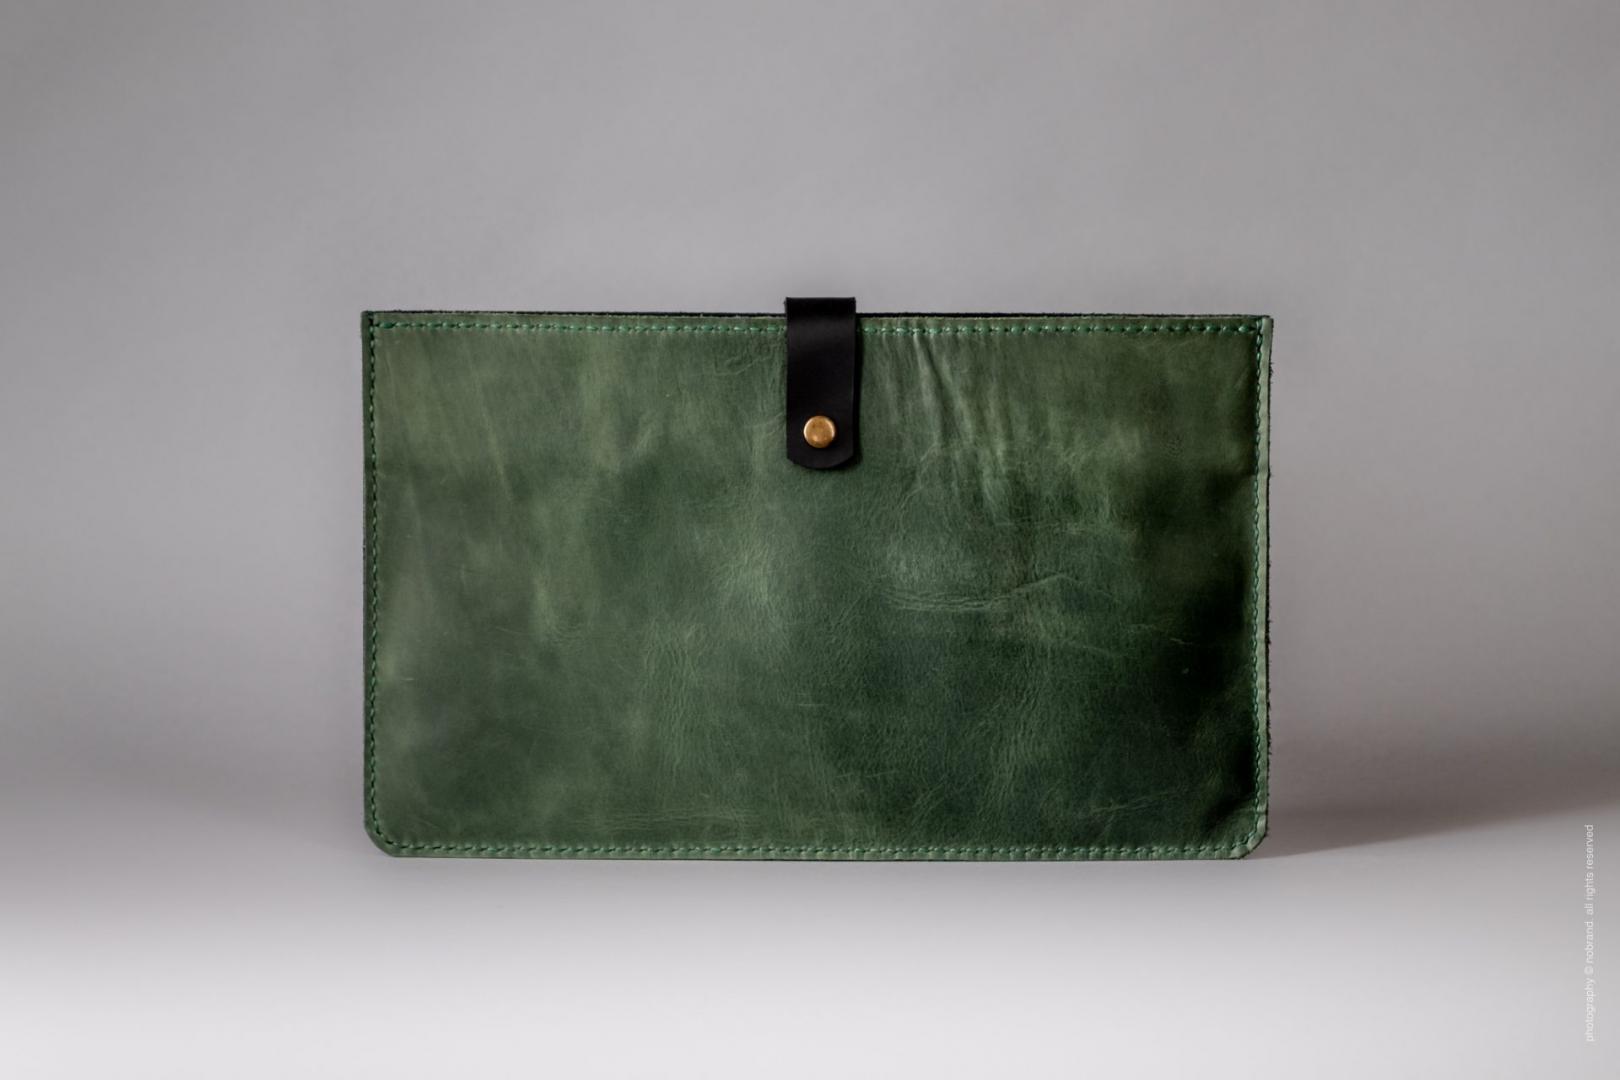 green macbook air case